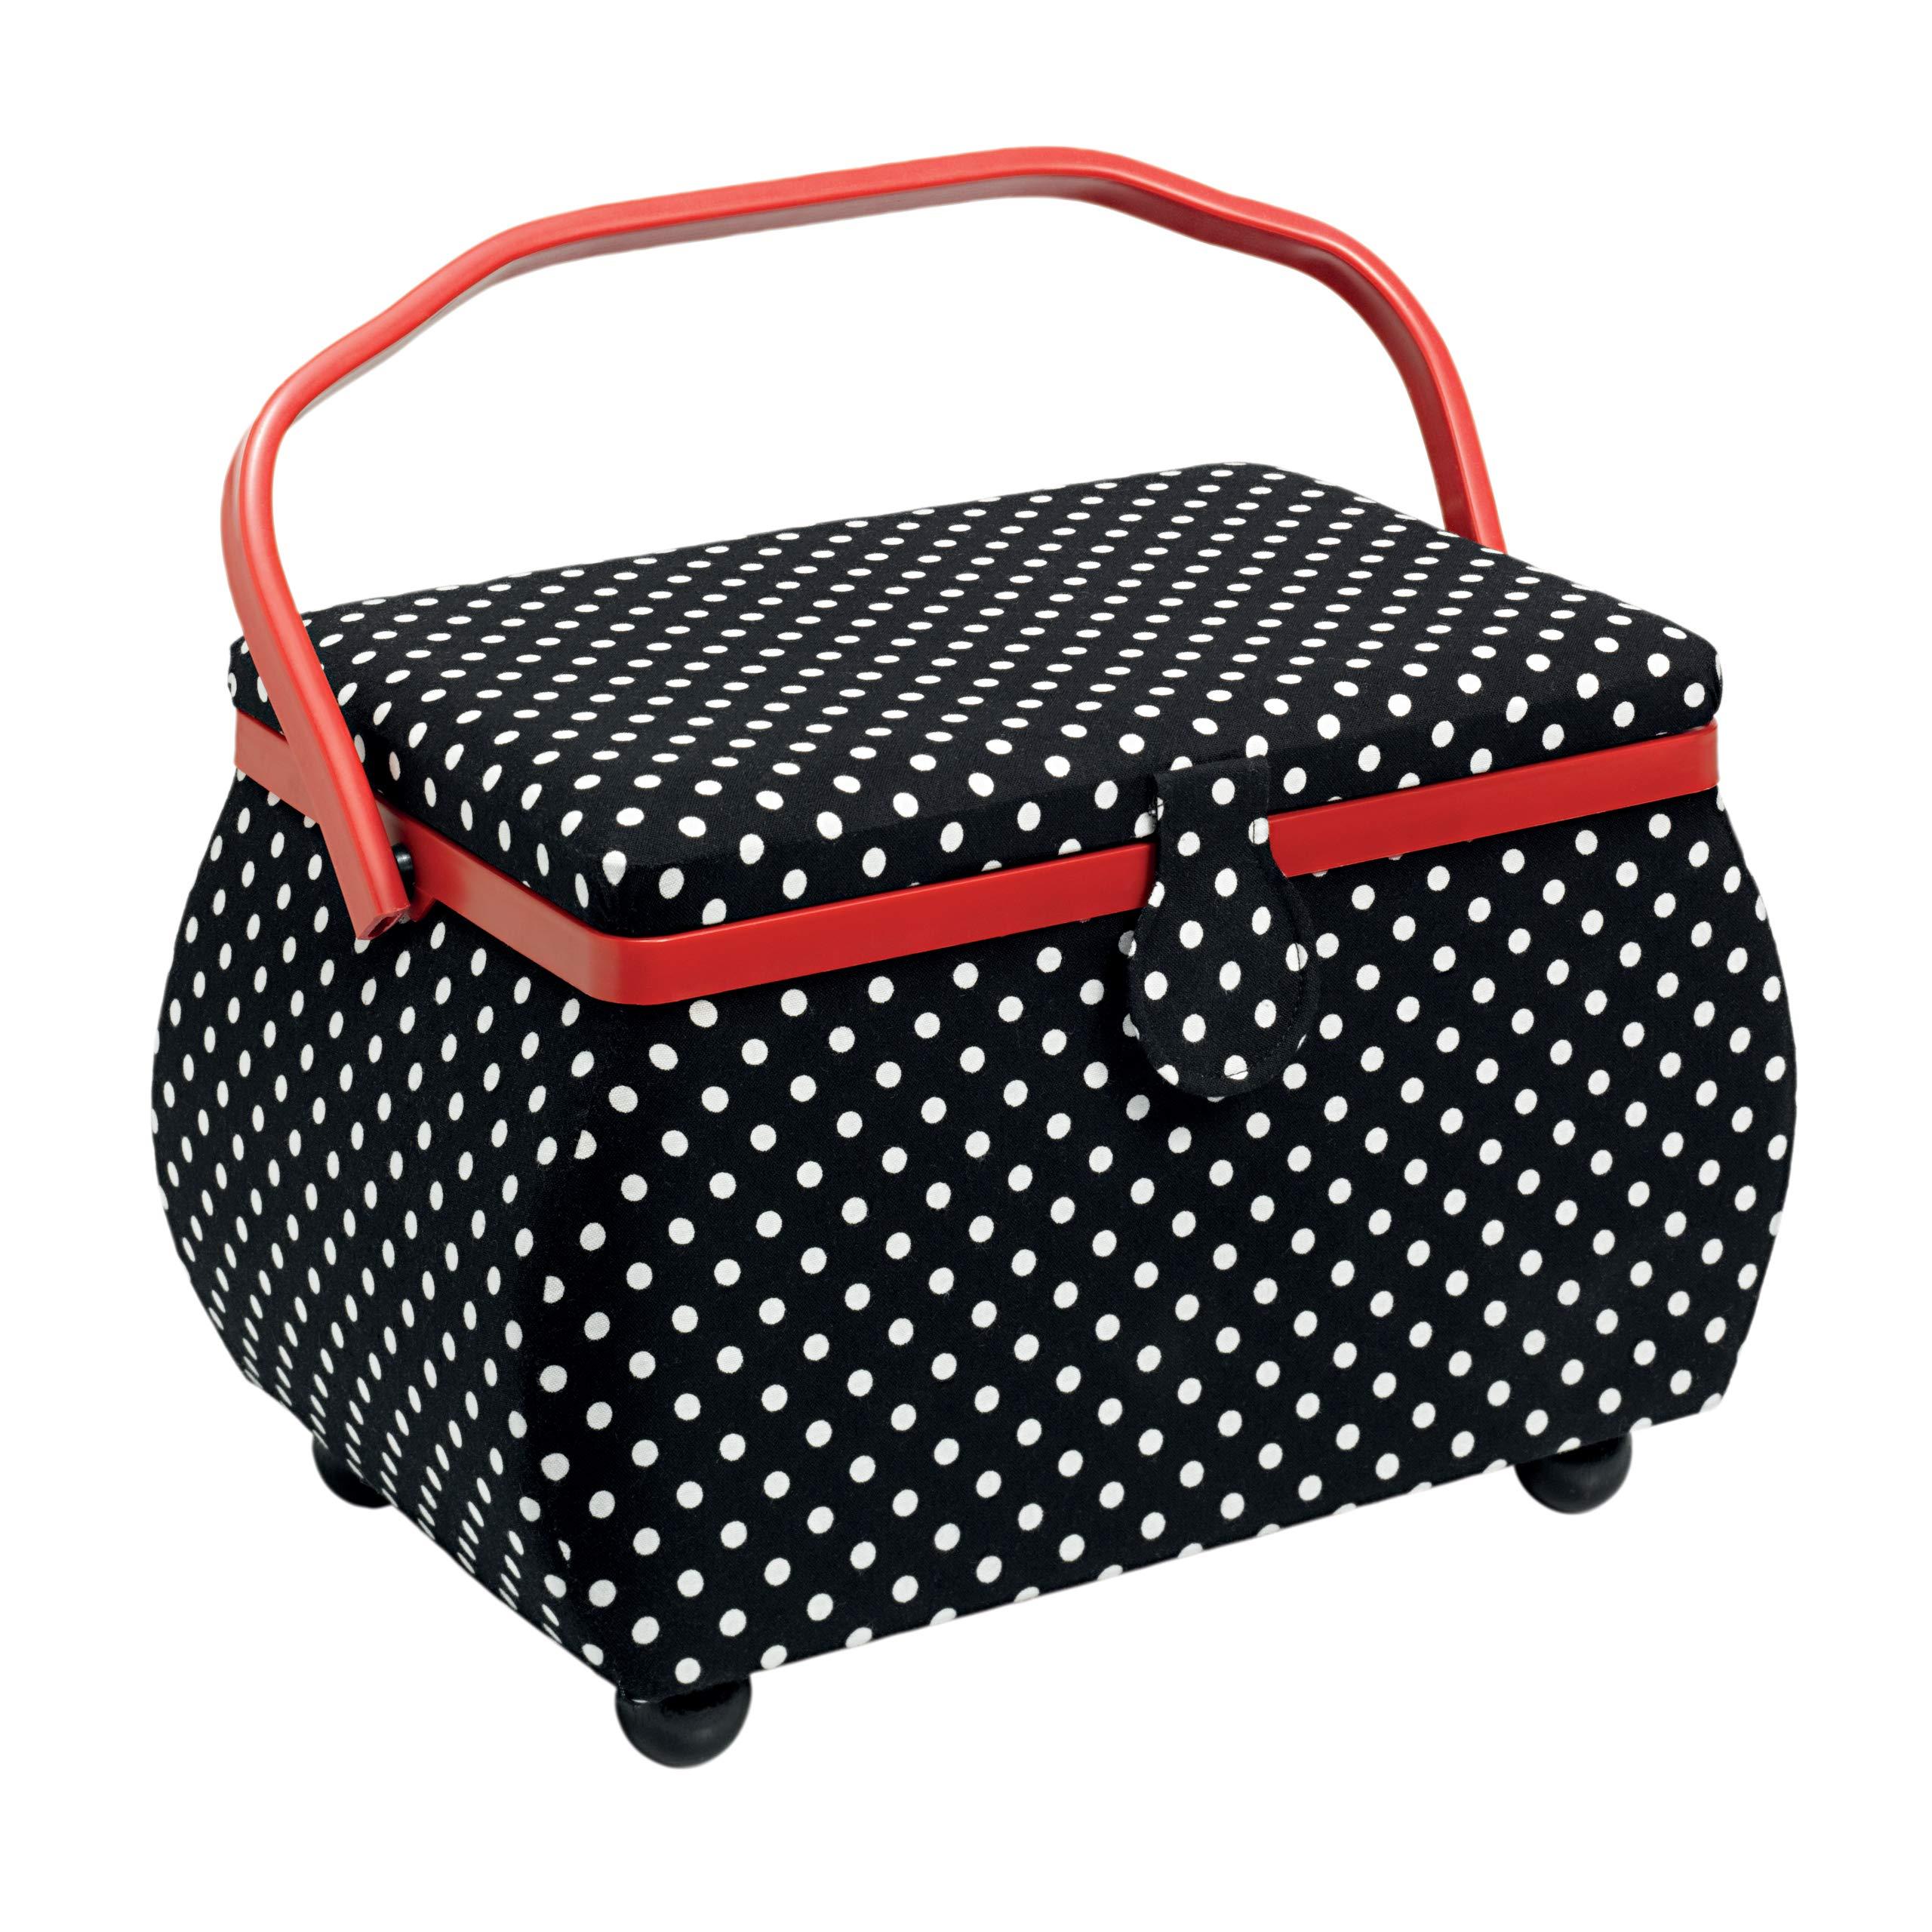 Prym 612246   Black & White Polka Dot Print Sewing Basket   32 x 20½ x 20cm by PRYM